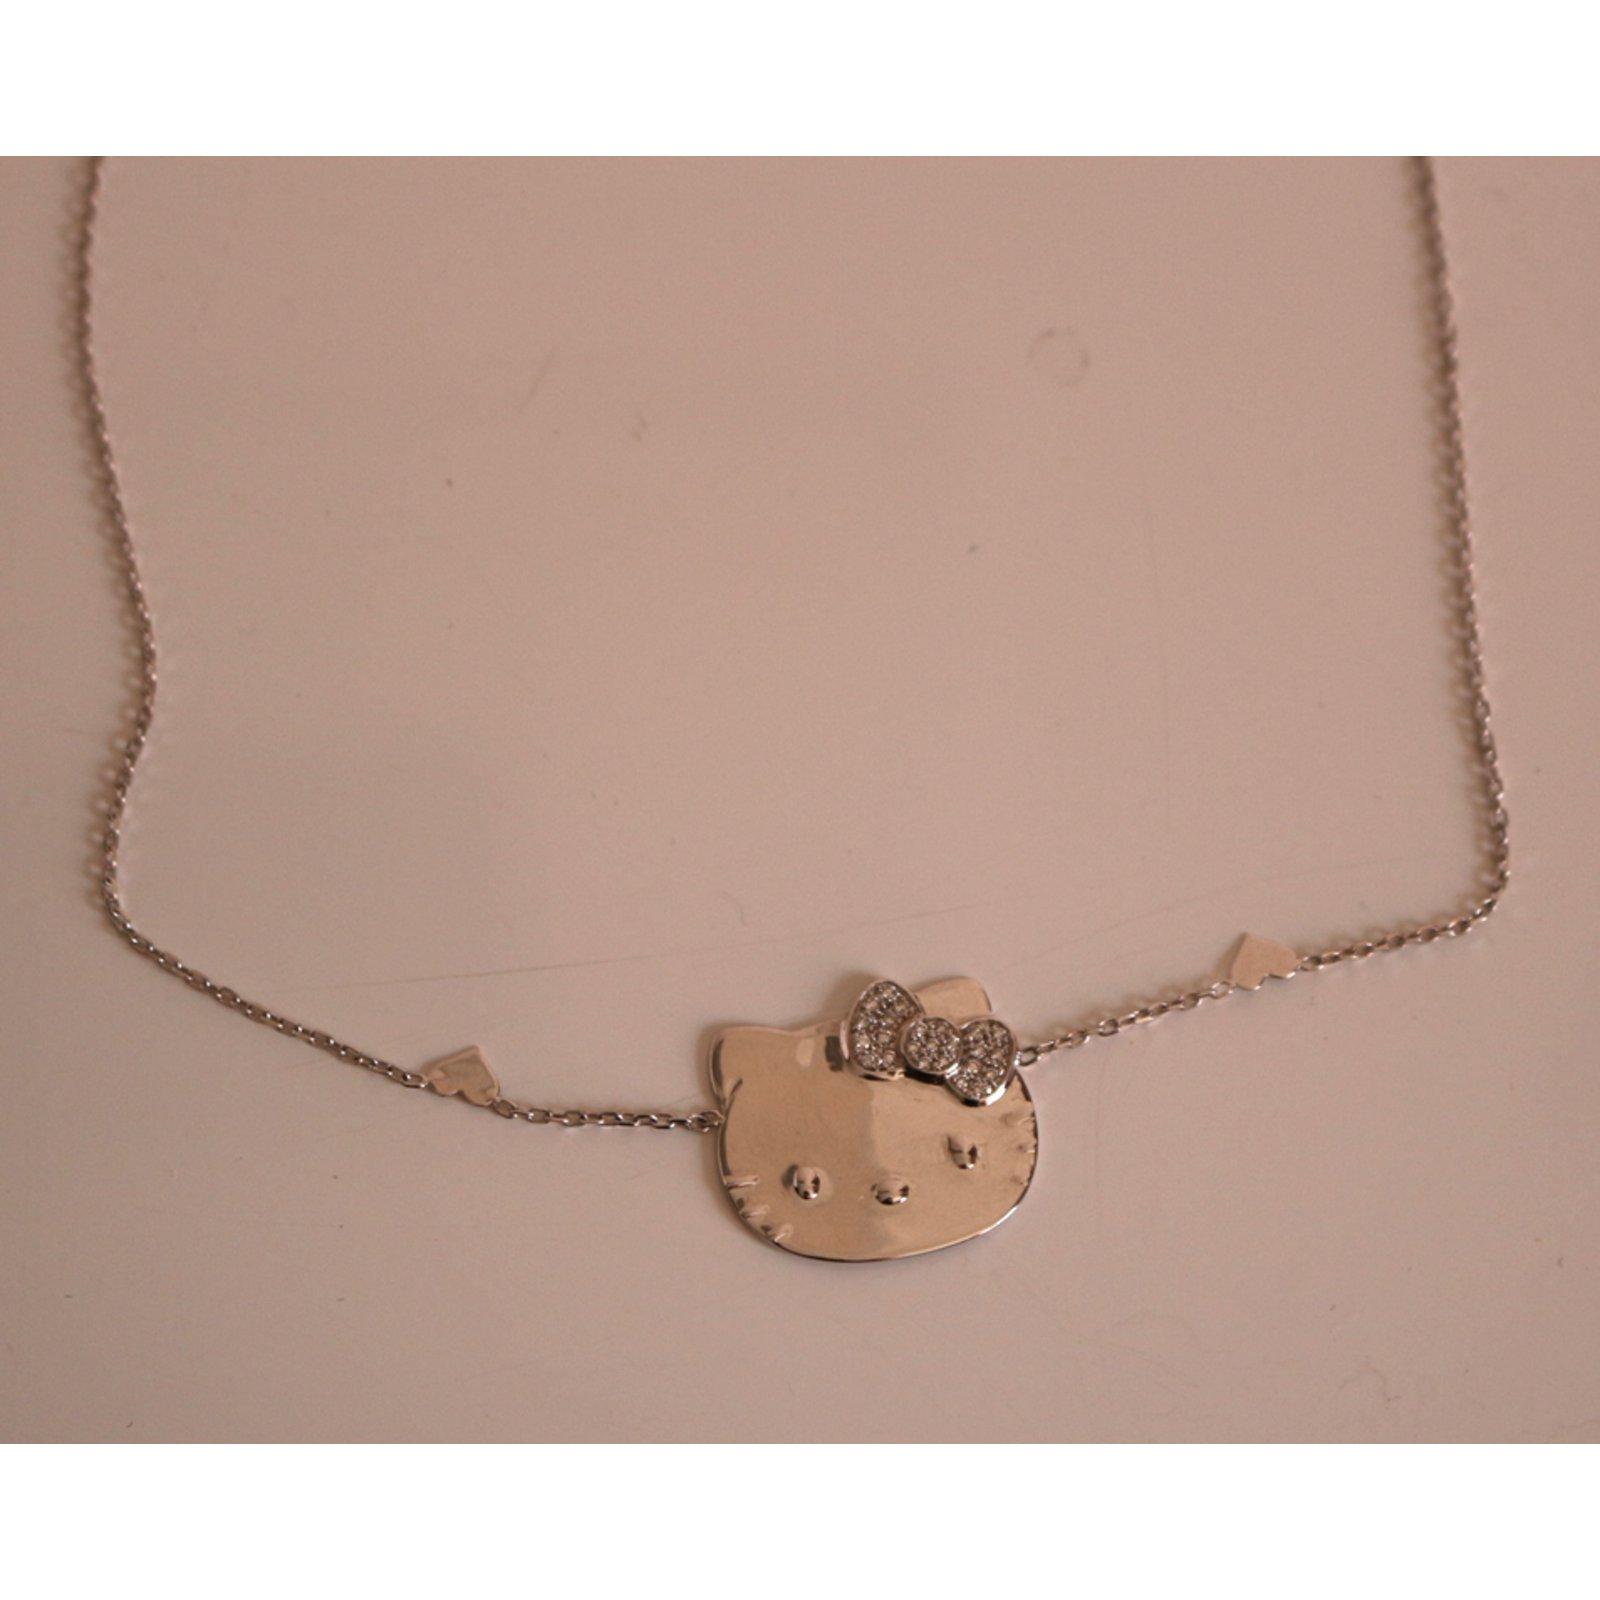 94c32fc61 Victoria Casal Hello Kitty Jewelry White gold Silvery ref.42432 - Joli  Closet